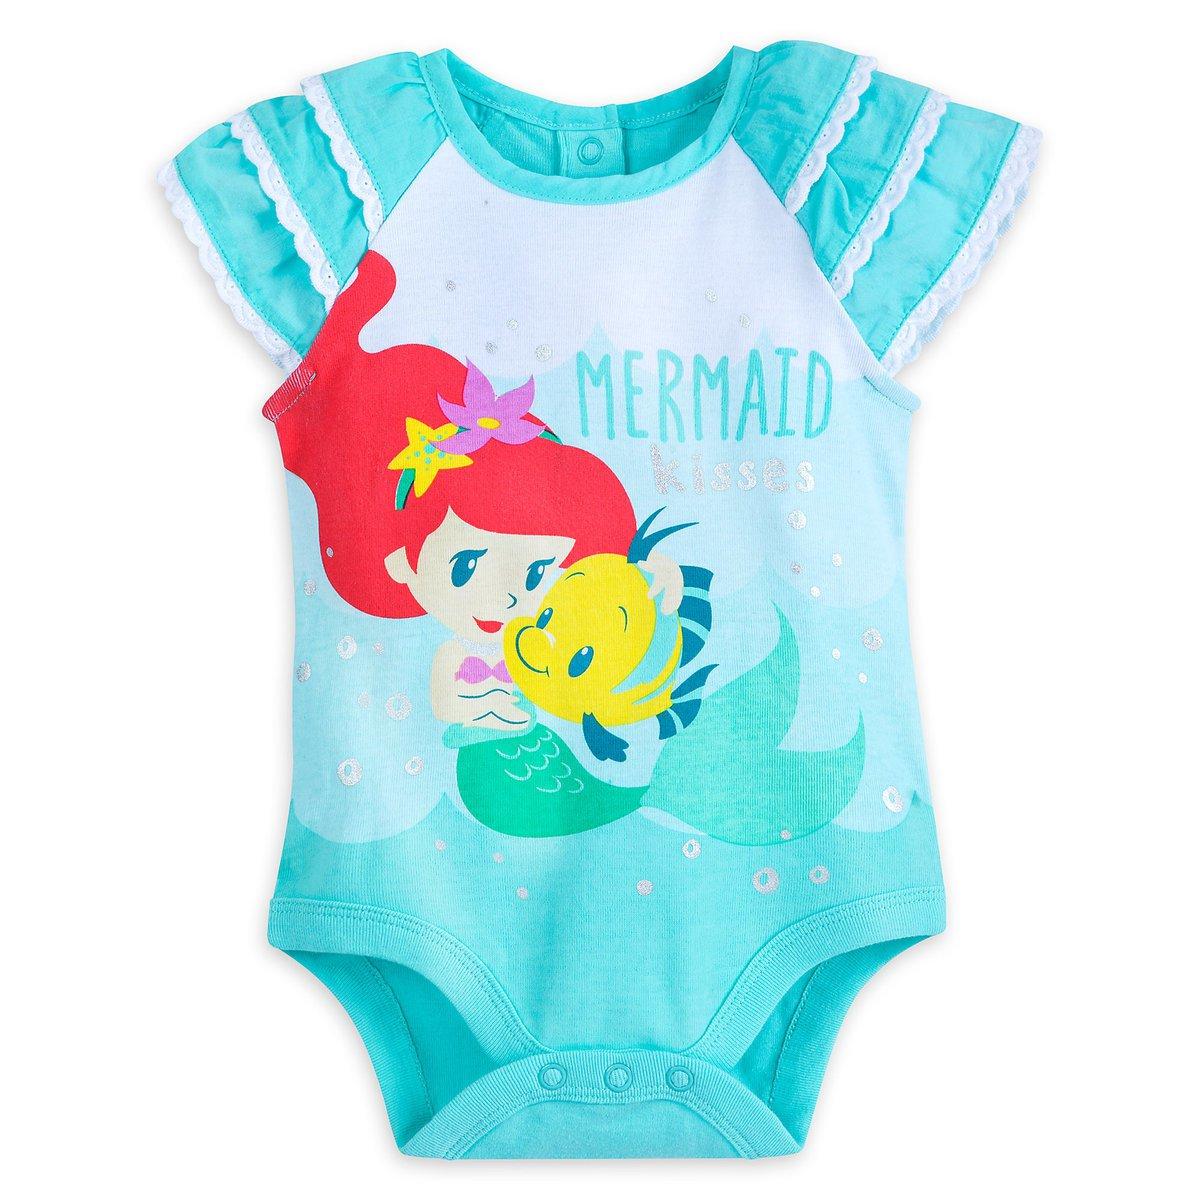 Disney Store Ariel Baby Bodysuit The Little Mermaid 12-18 Months 2018 New